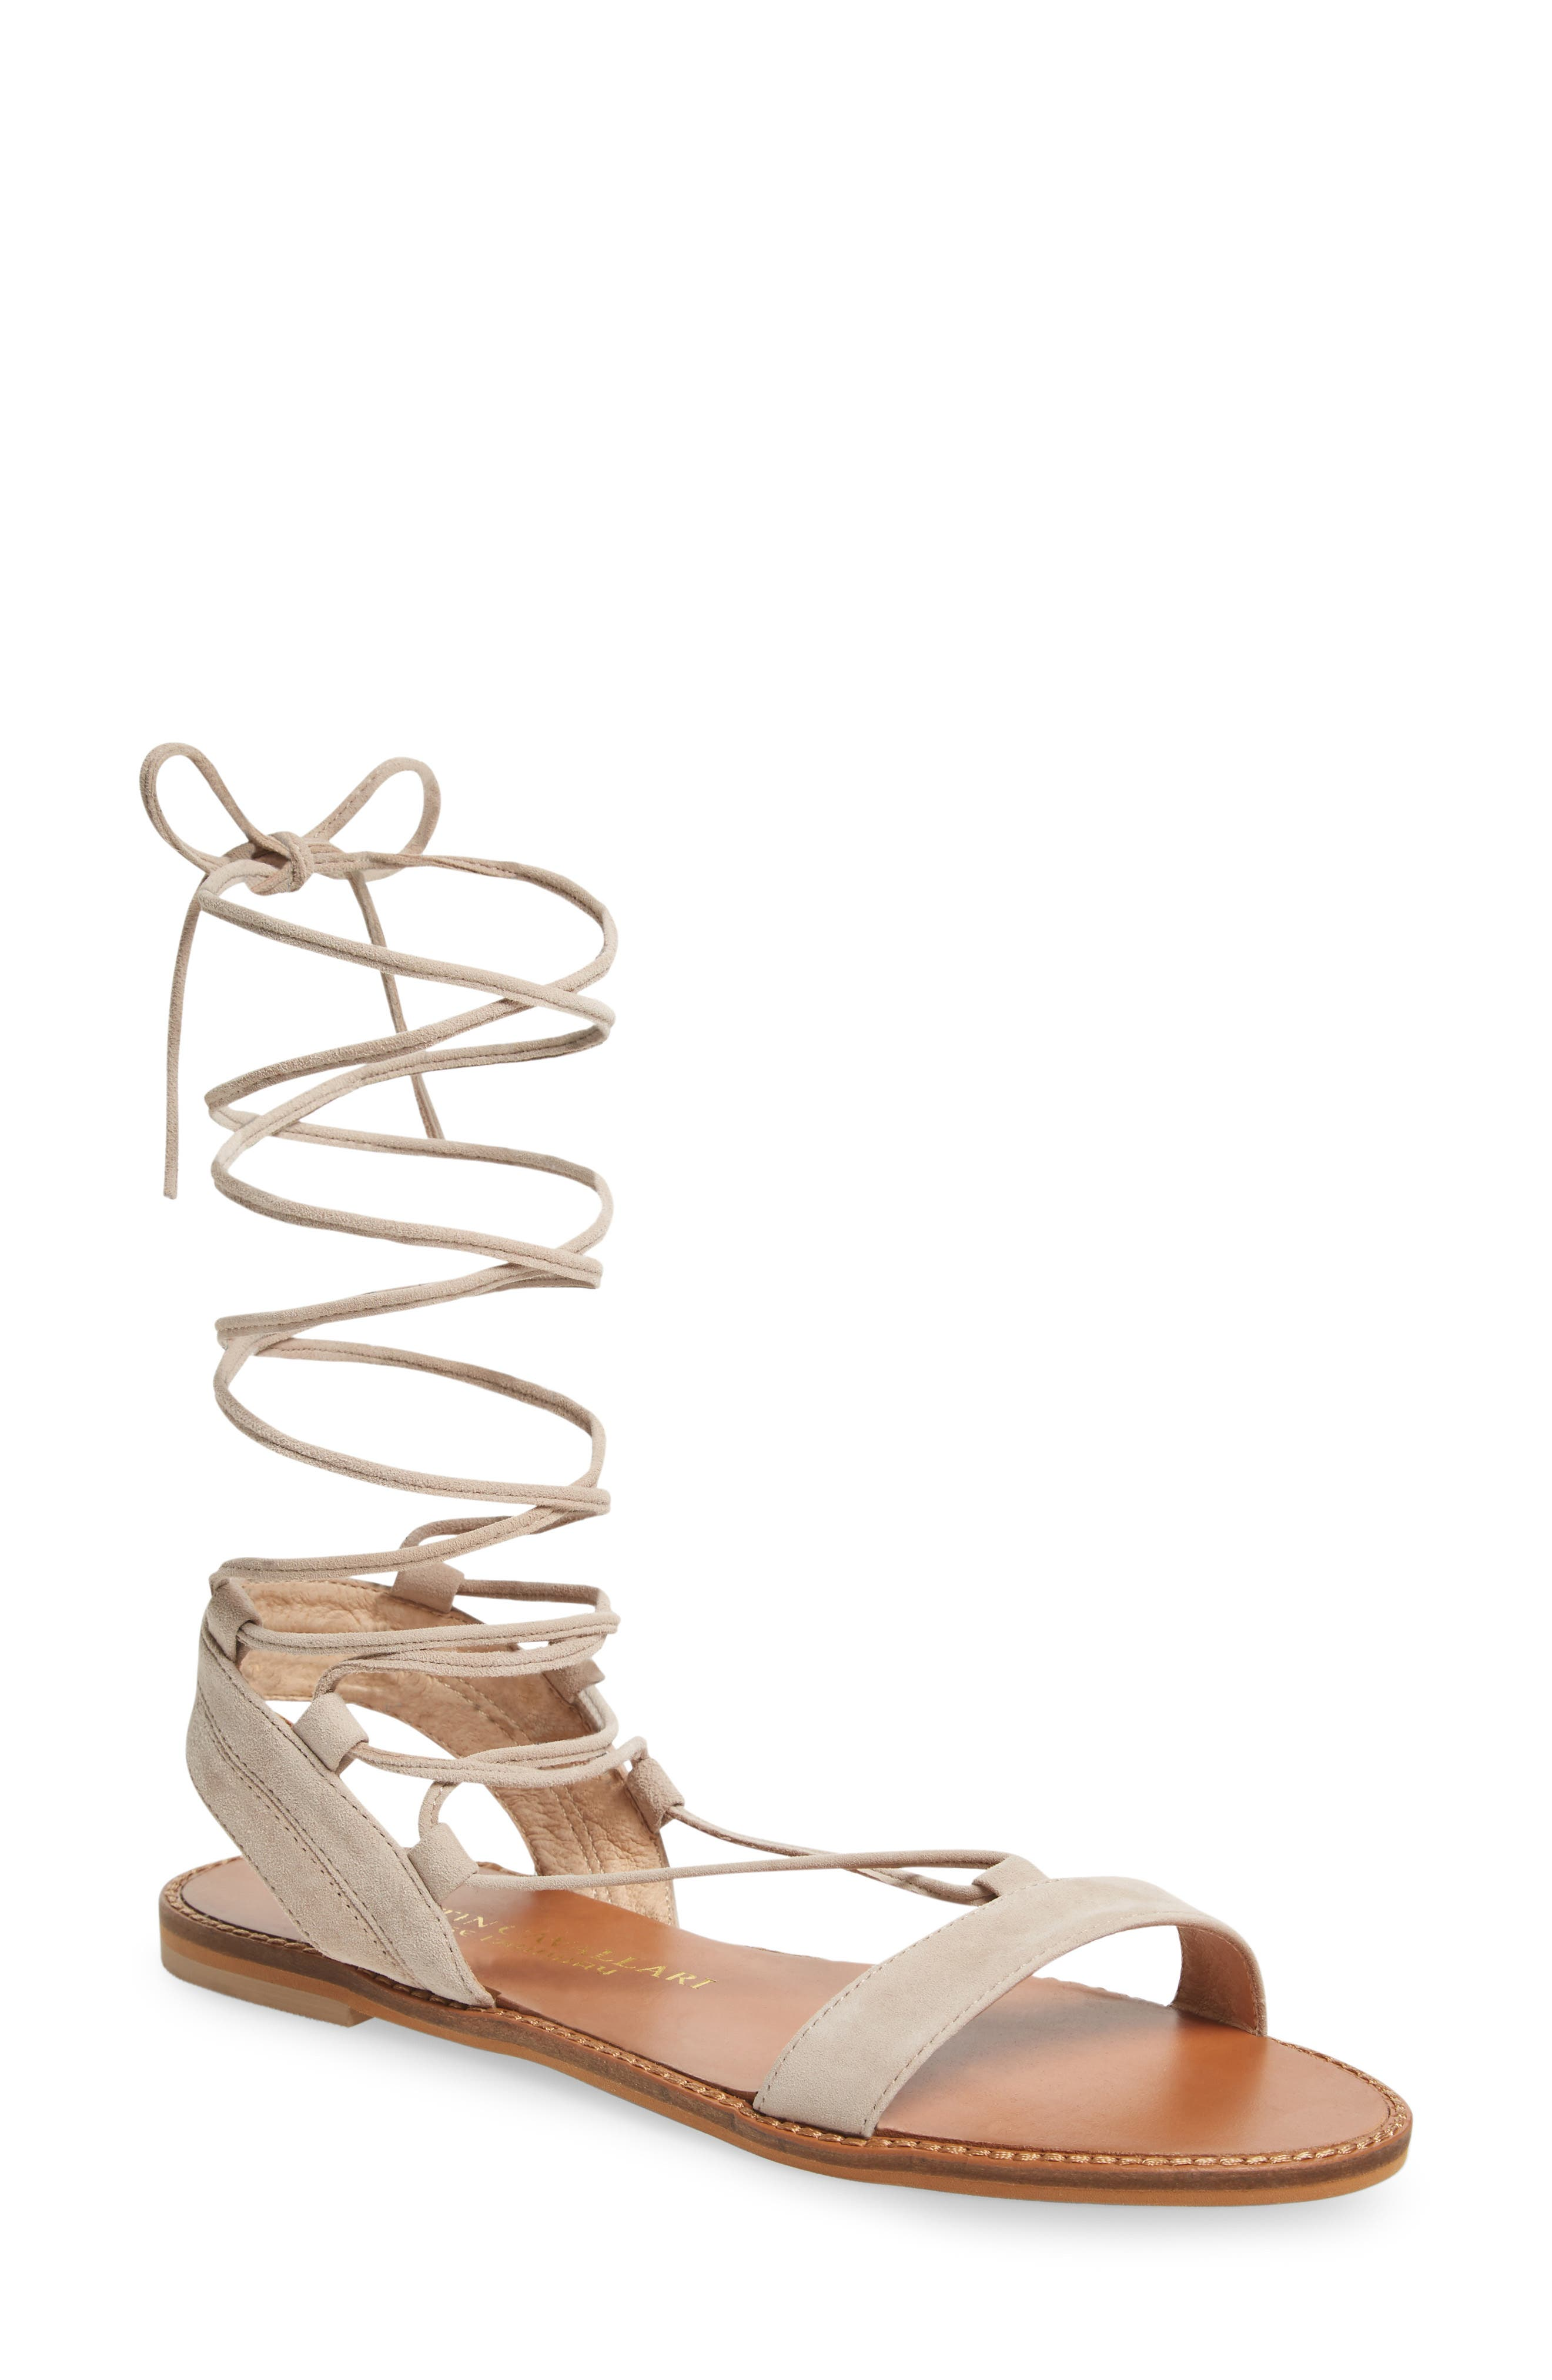 Brea Ankle Wrap Sandal,                             Main thumbnail 2, color,